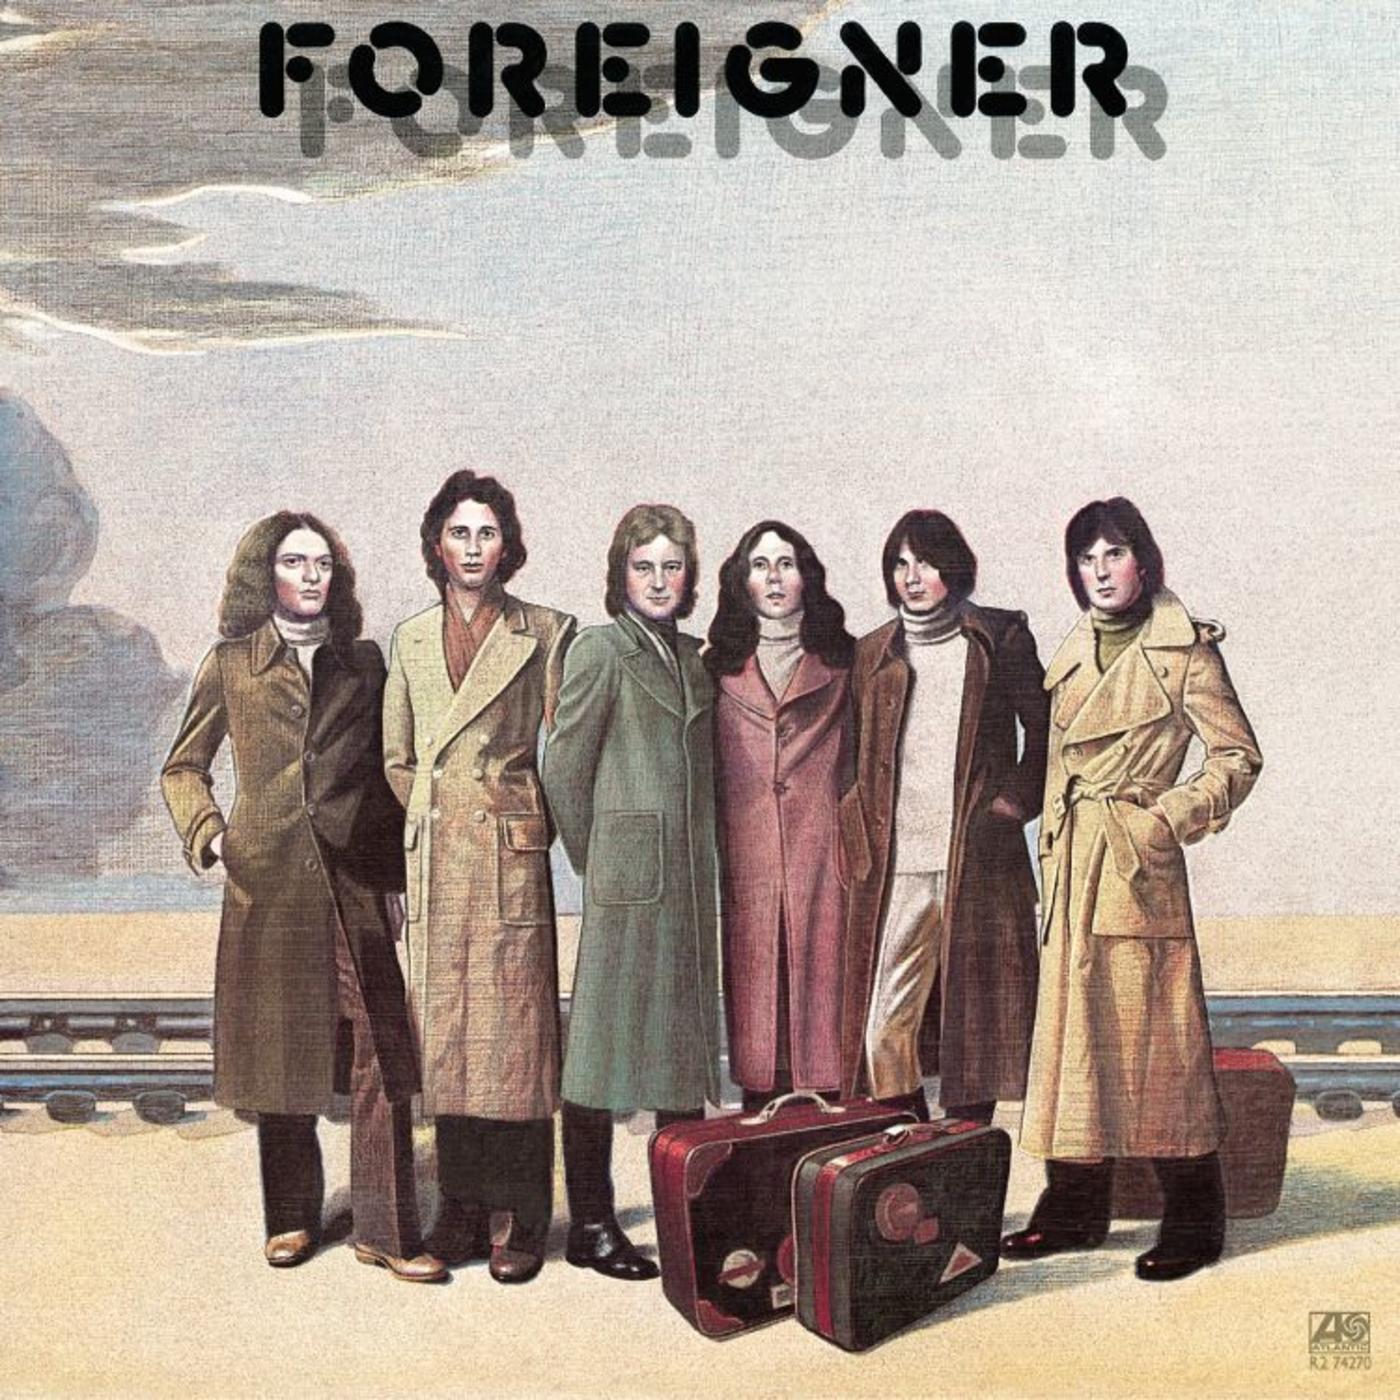 Foreigner - The Complete Atlantic Studio Albums 1977-1991 | Rhino